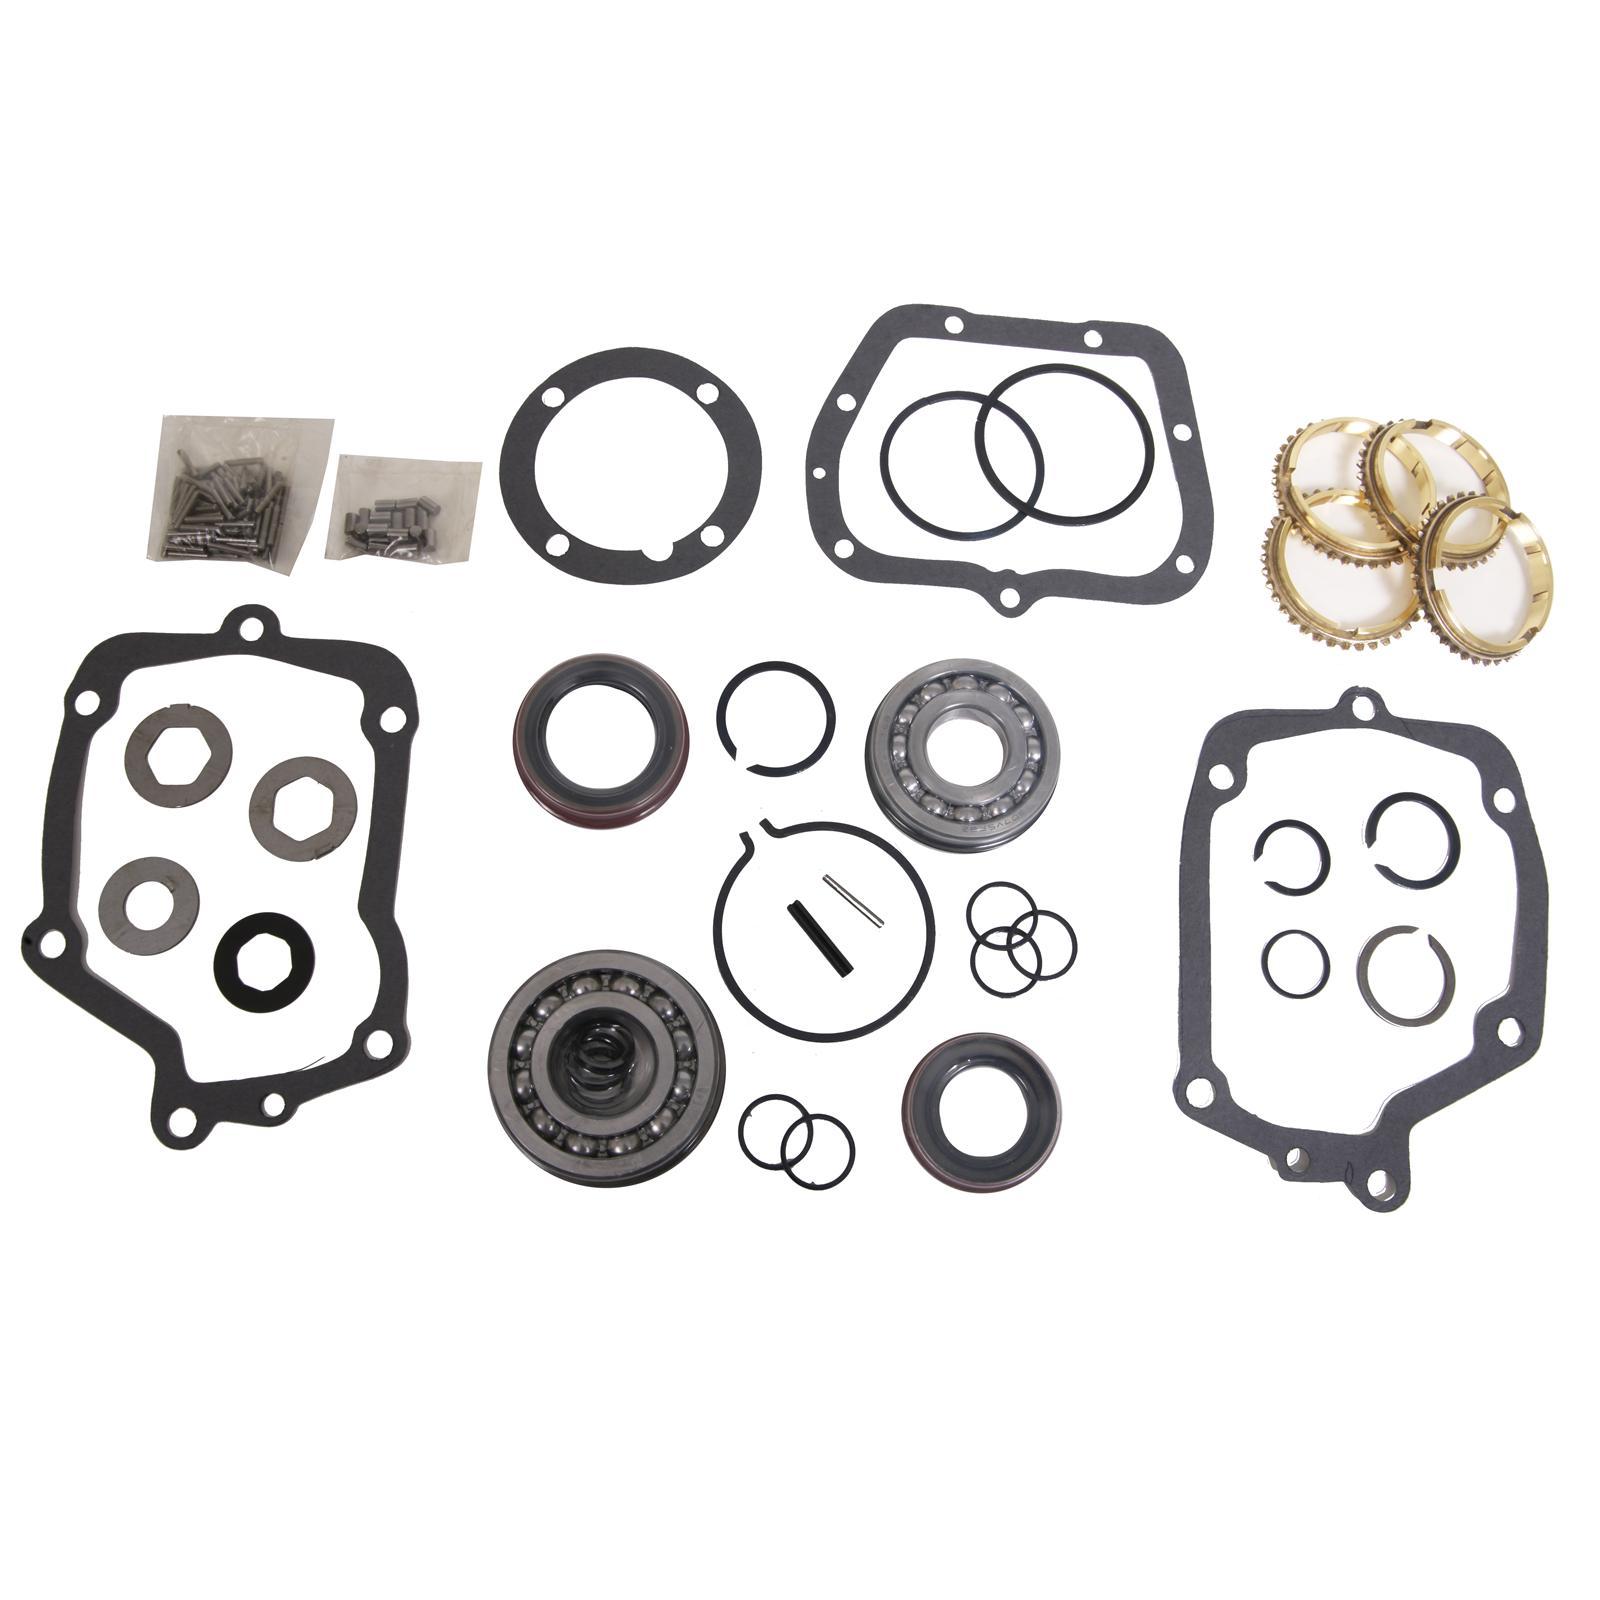 Motive Gear Transmission Rebuild Kit Muncie M 21 M 22 Kit